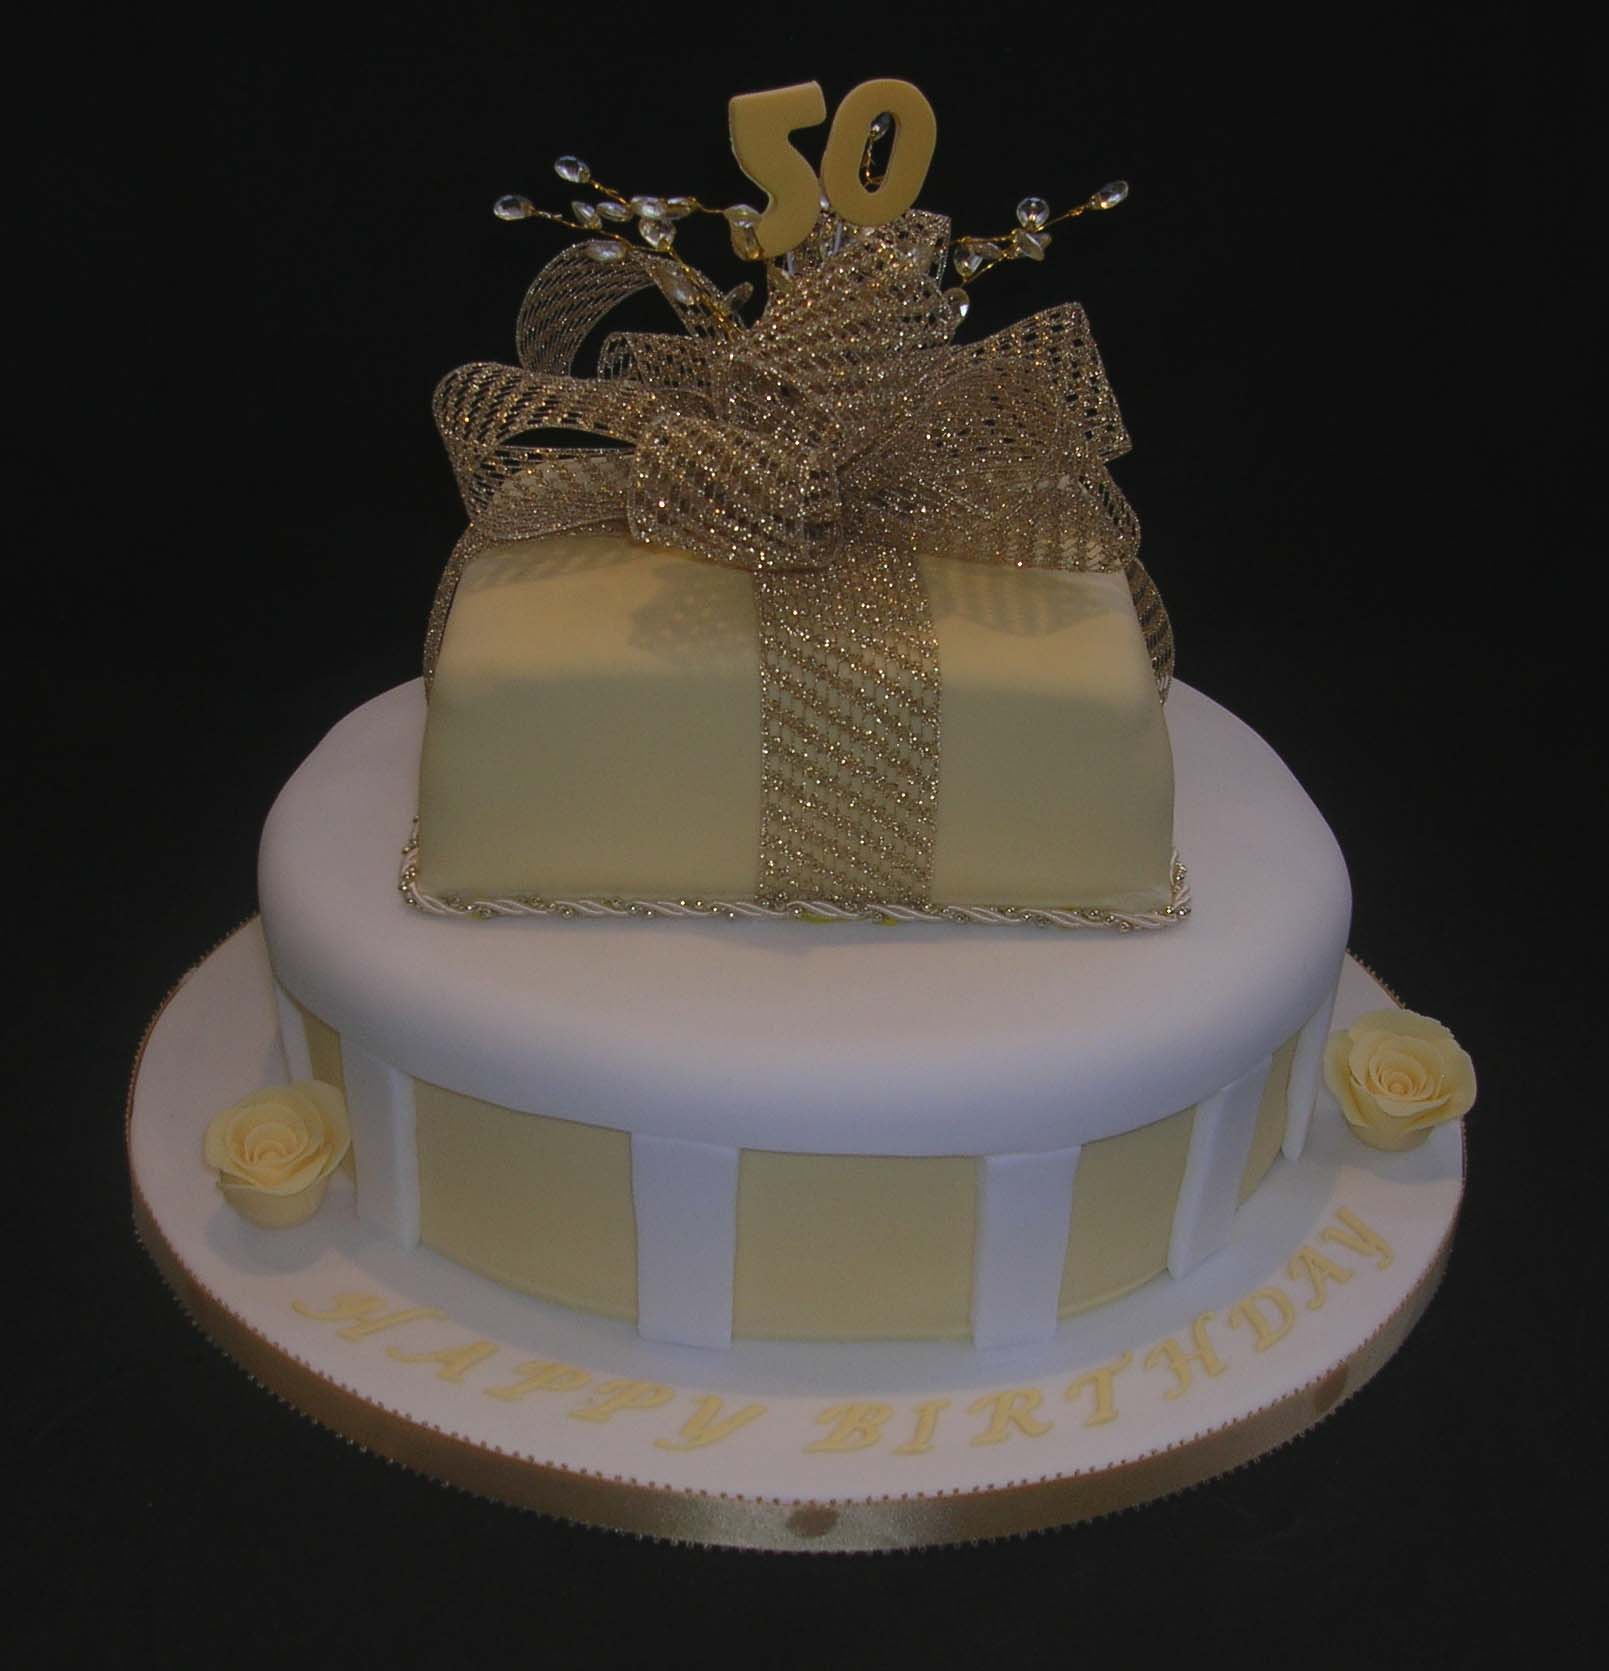 Wondrous 13 Cool 50Th Birthday Cakes Photo 50Th Birthday Cake Ideas Funny Birthday Cards Online Overcheapnameinfo